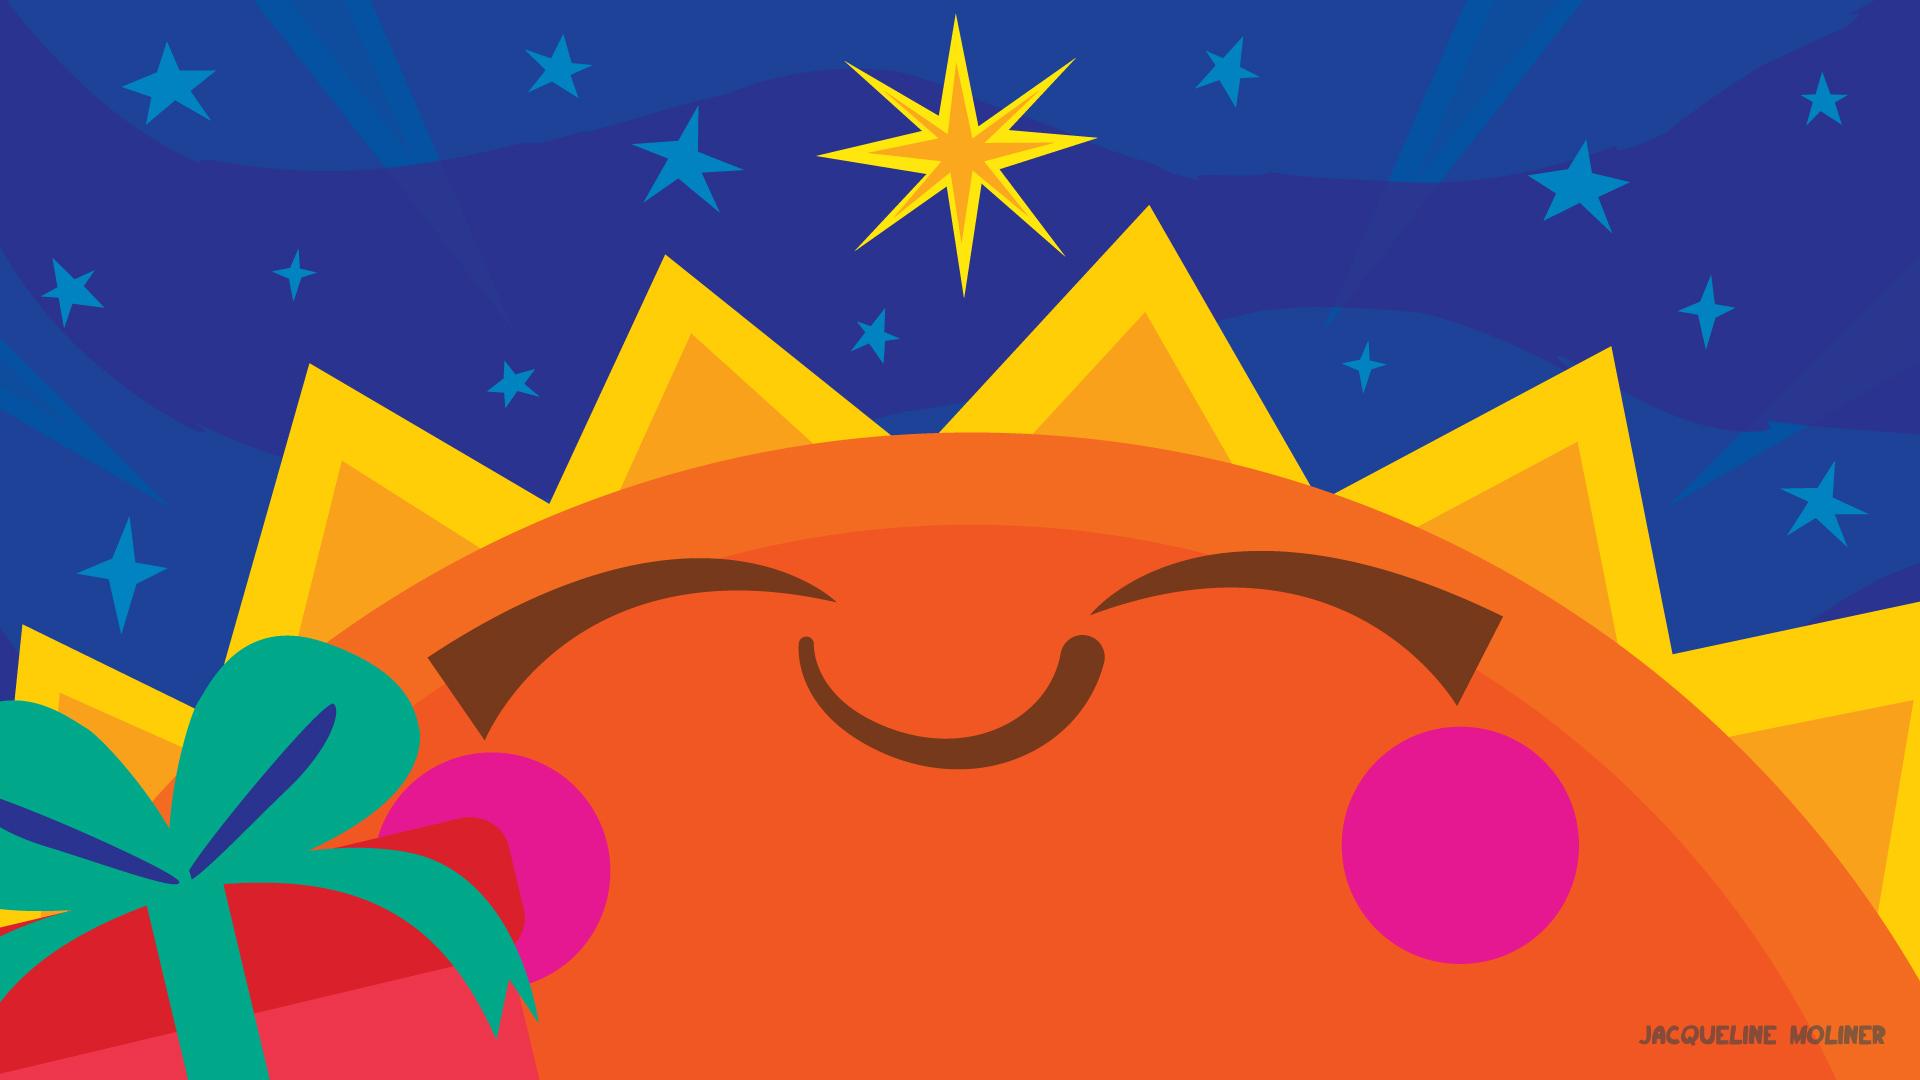 Sun Holiday Wallpaper